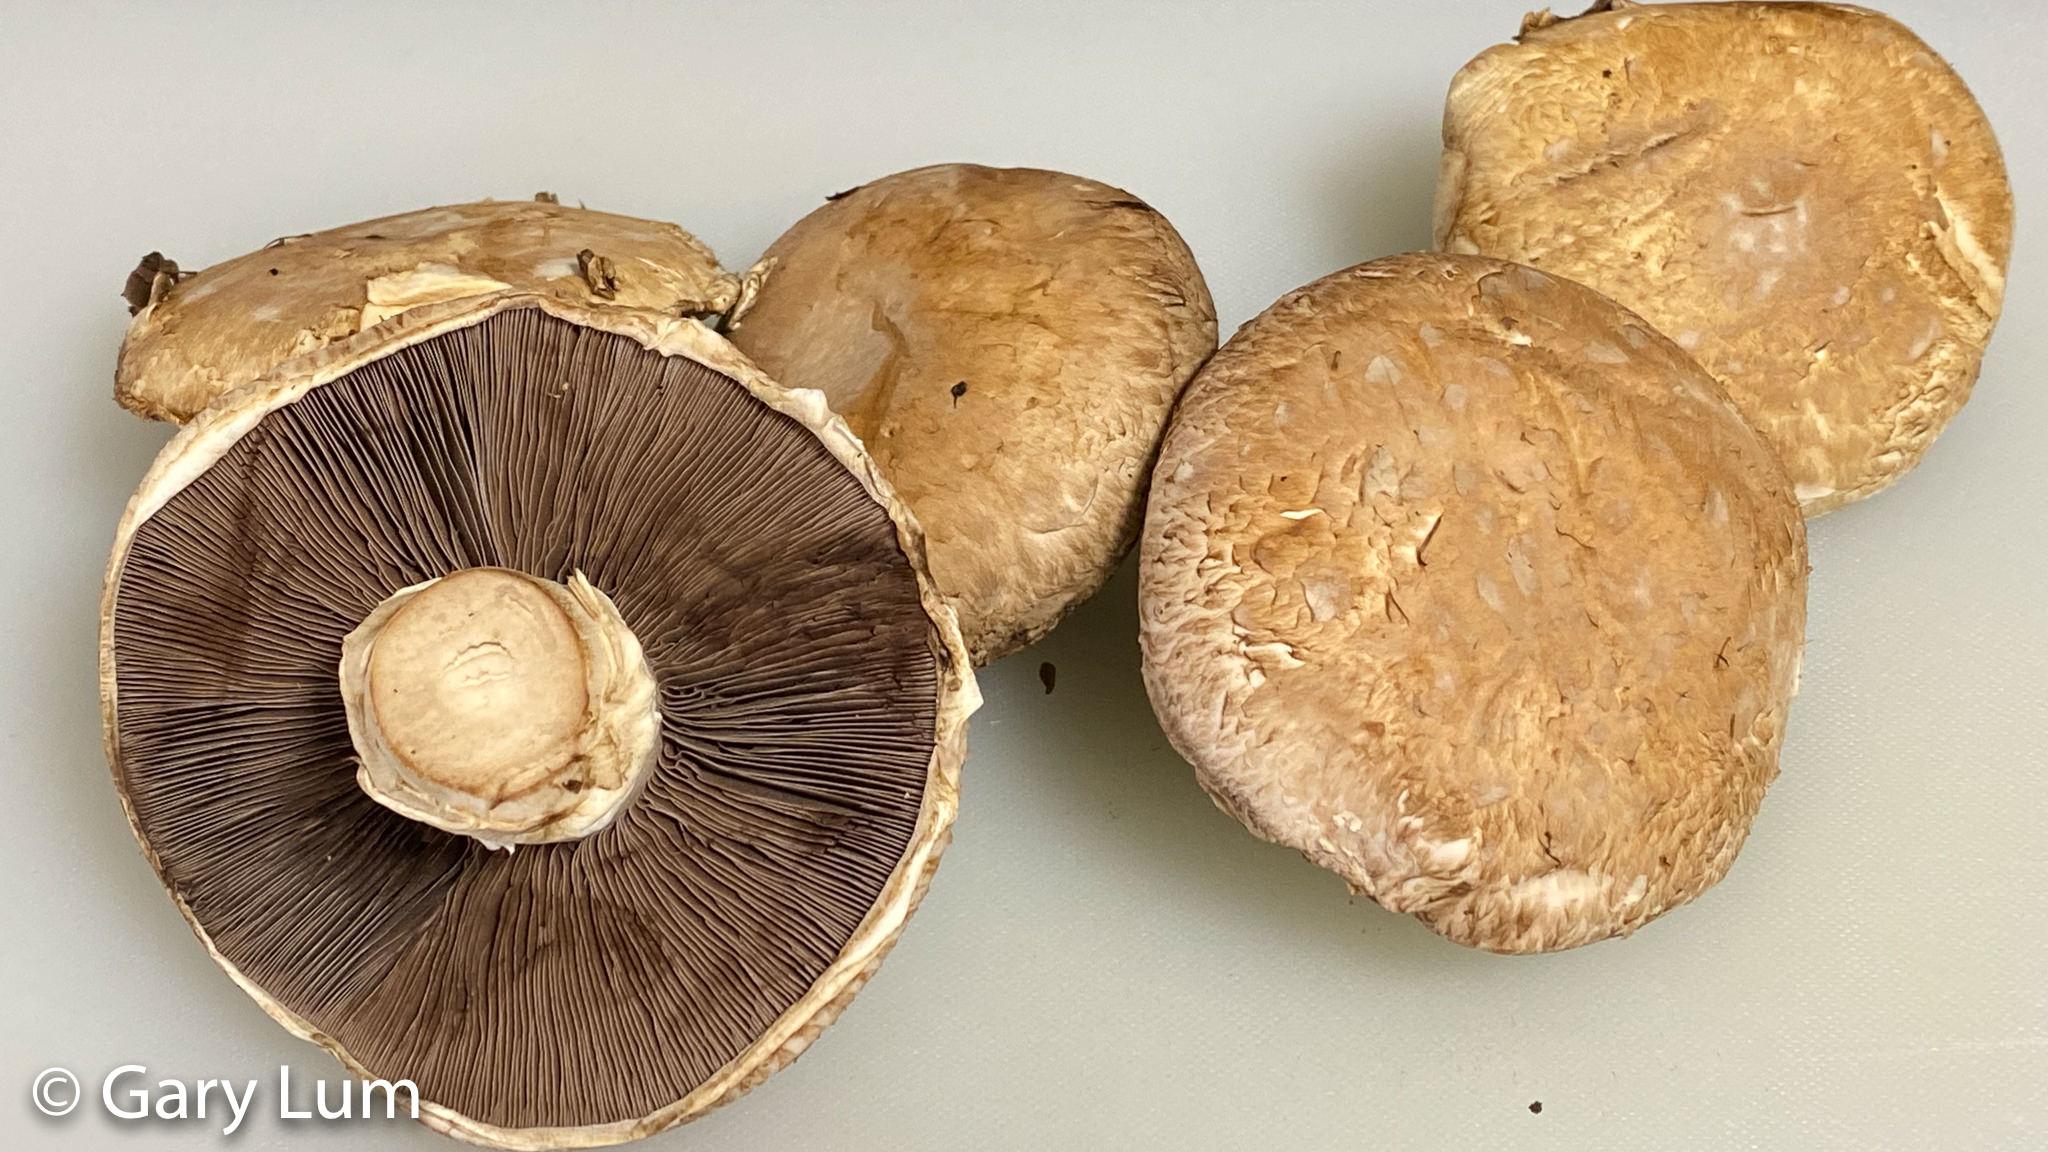 Mushrooms ready for sautéing. Gary Lum.